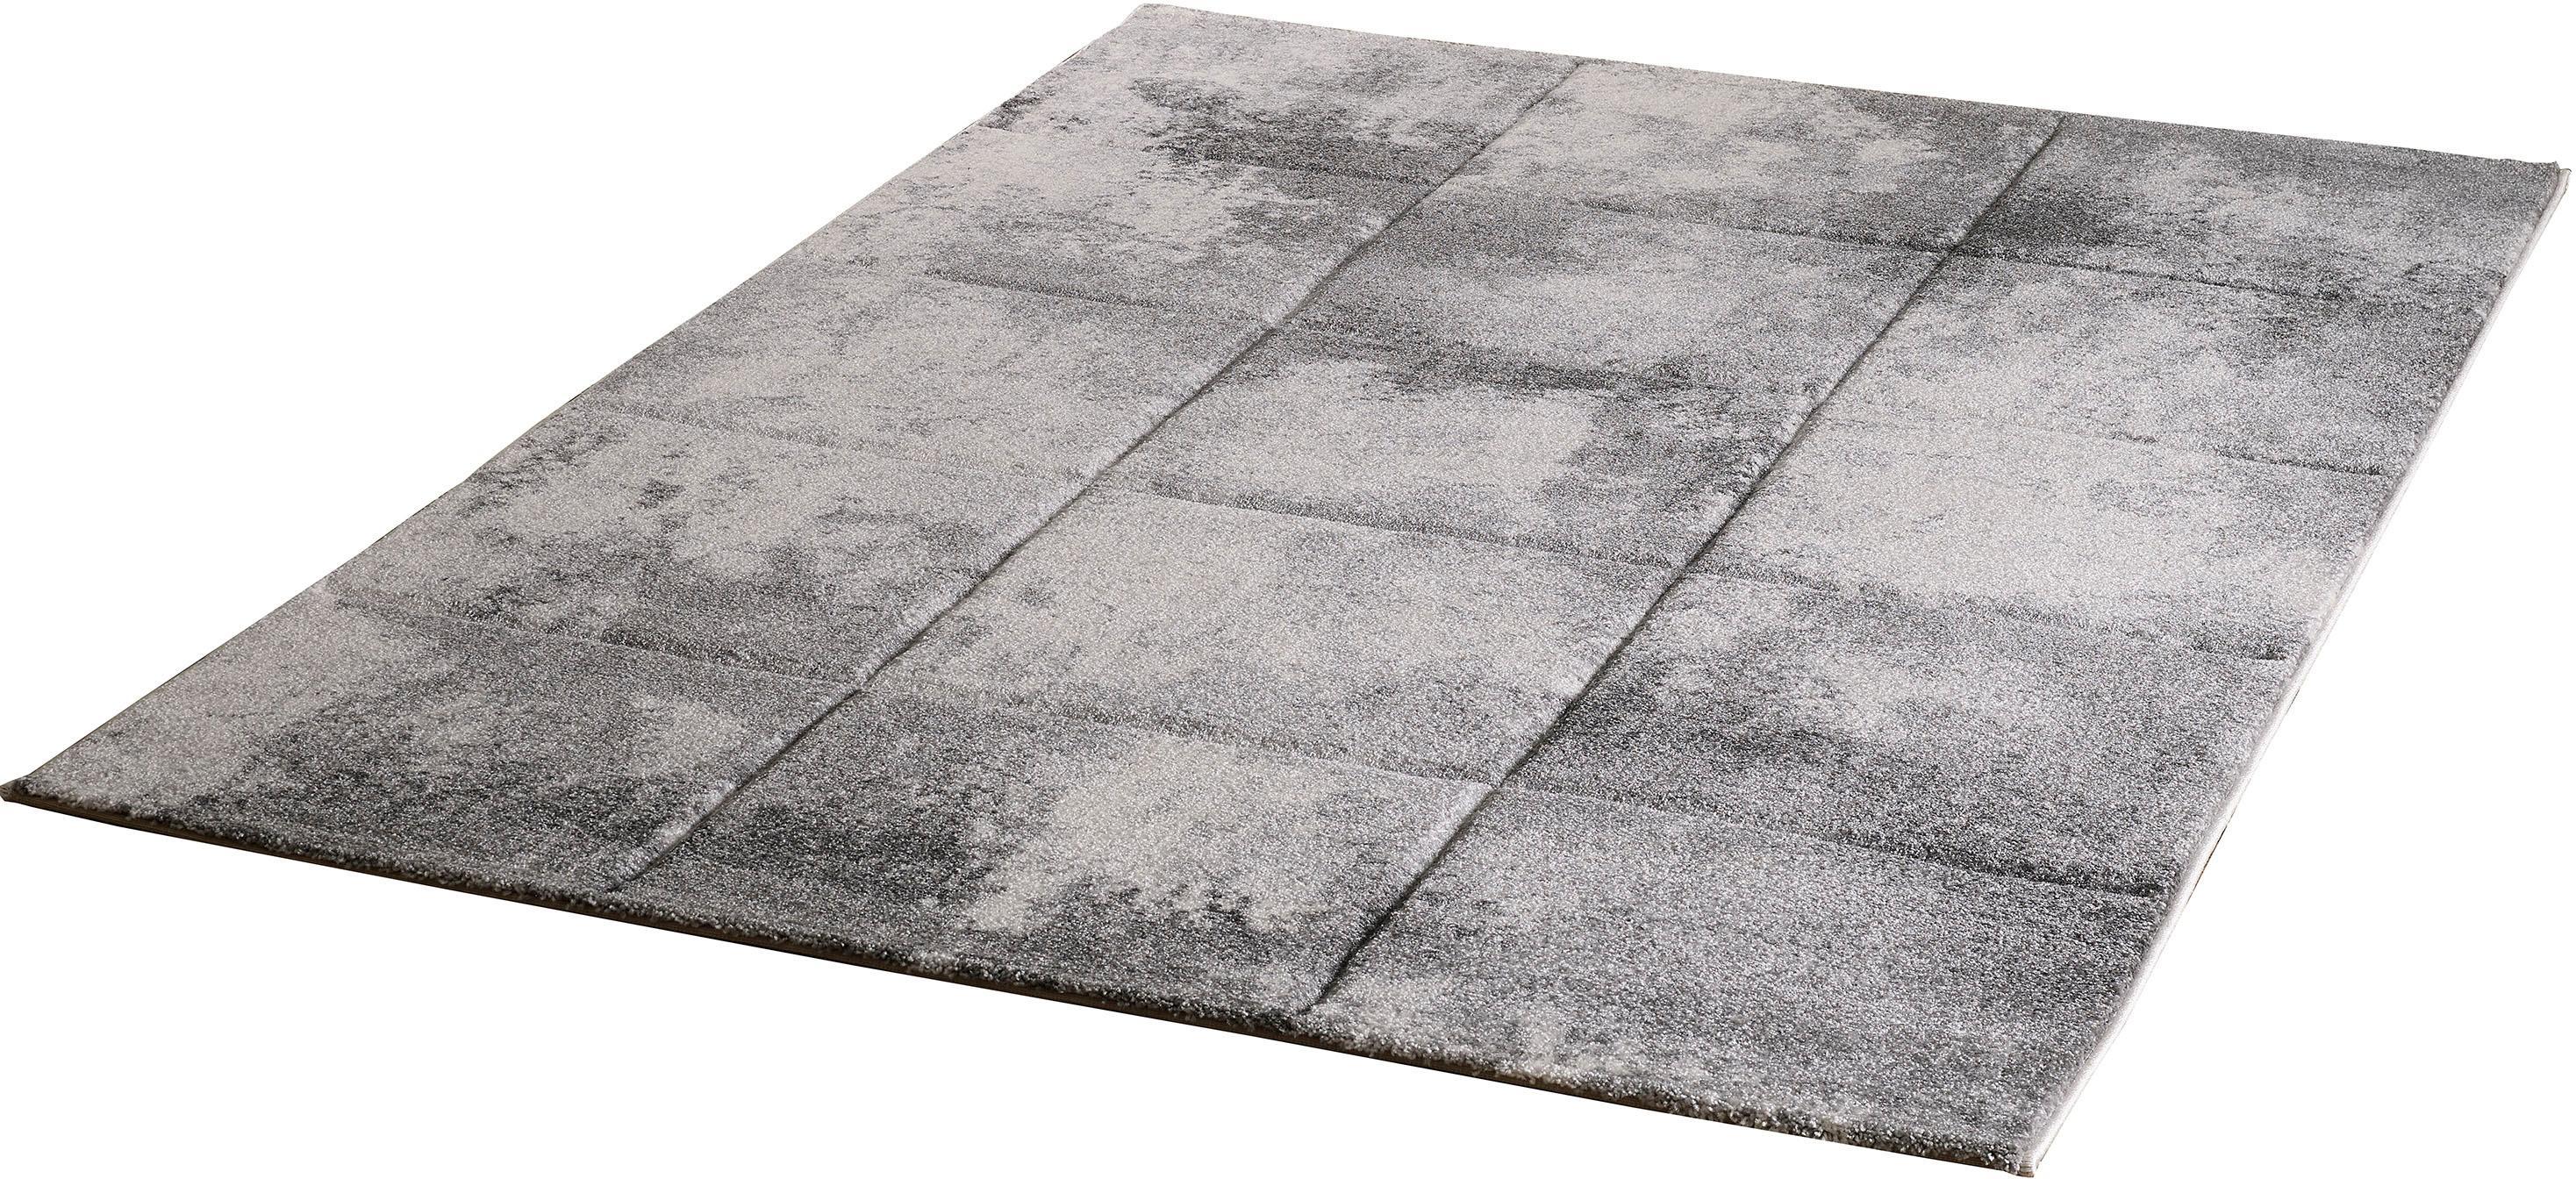 Teppich Lorena 2902 Sanat Teppiche rechteckig Höhe 13 mm maschinell gewebt